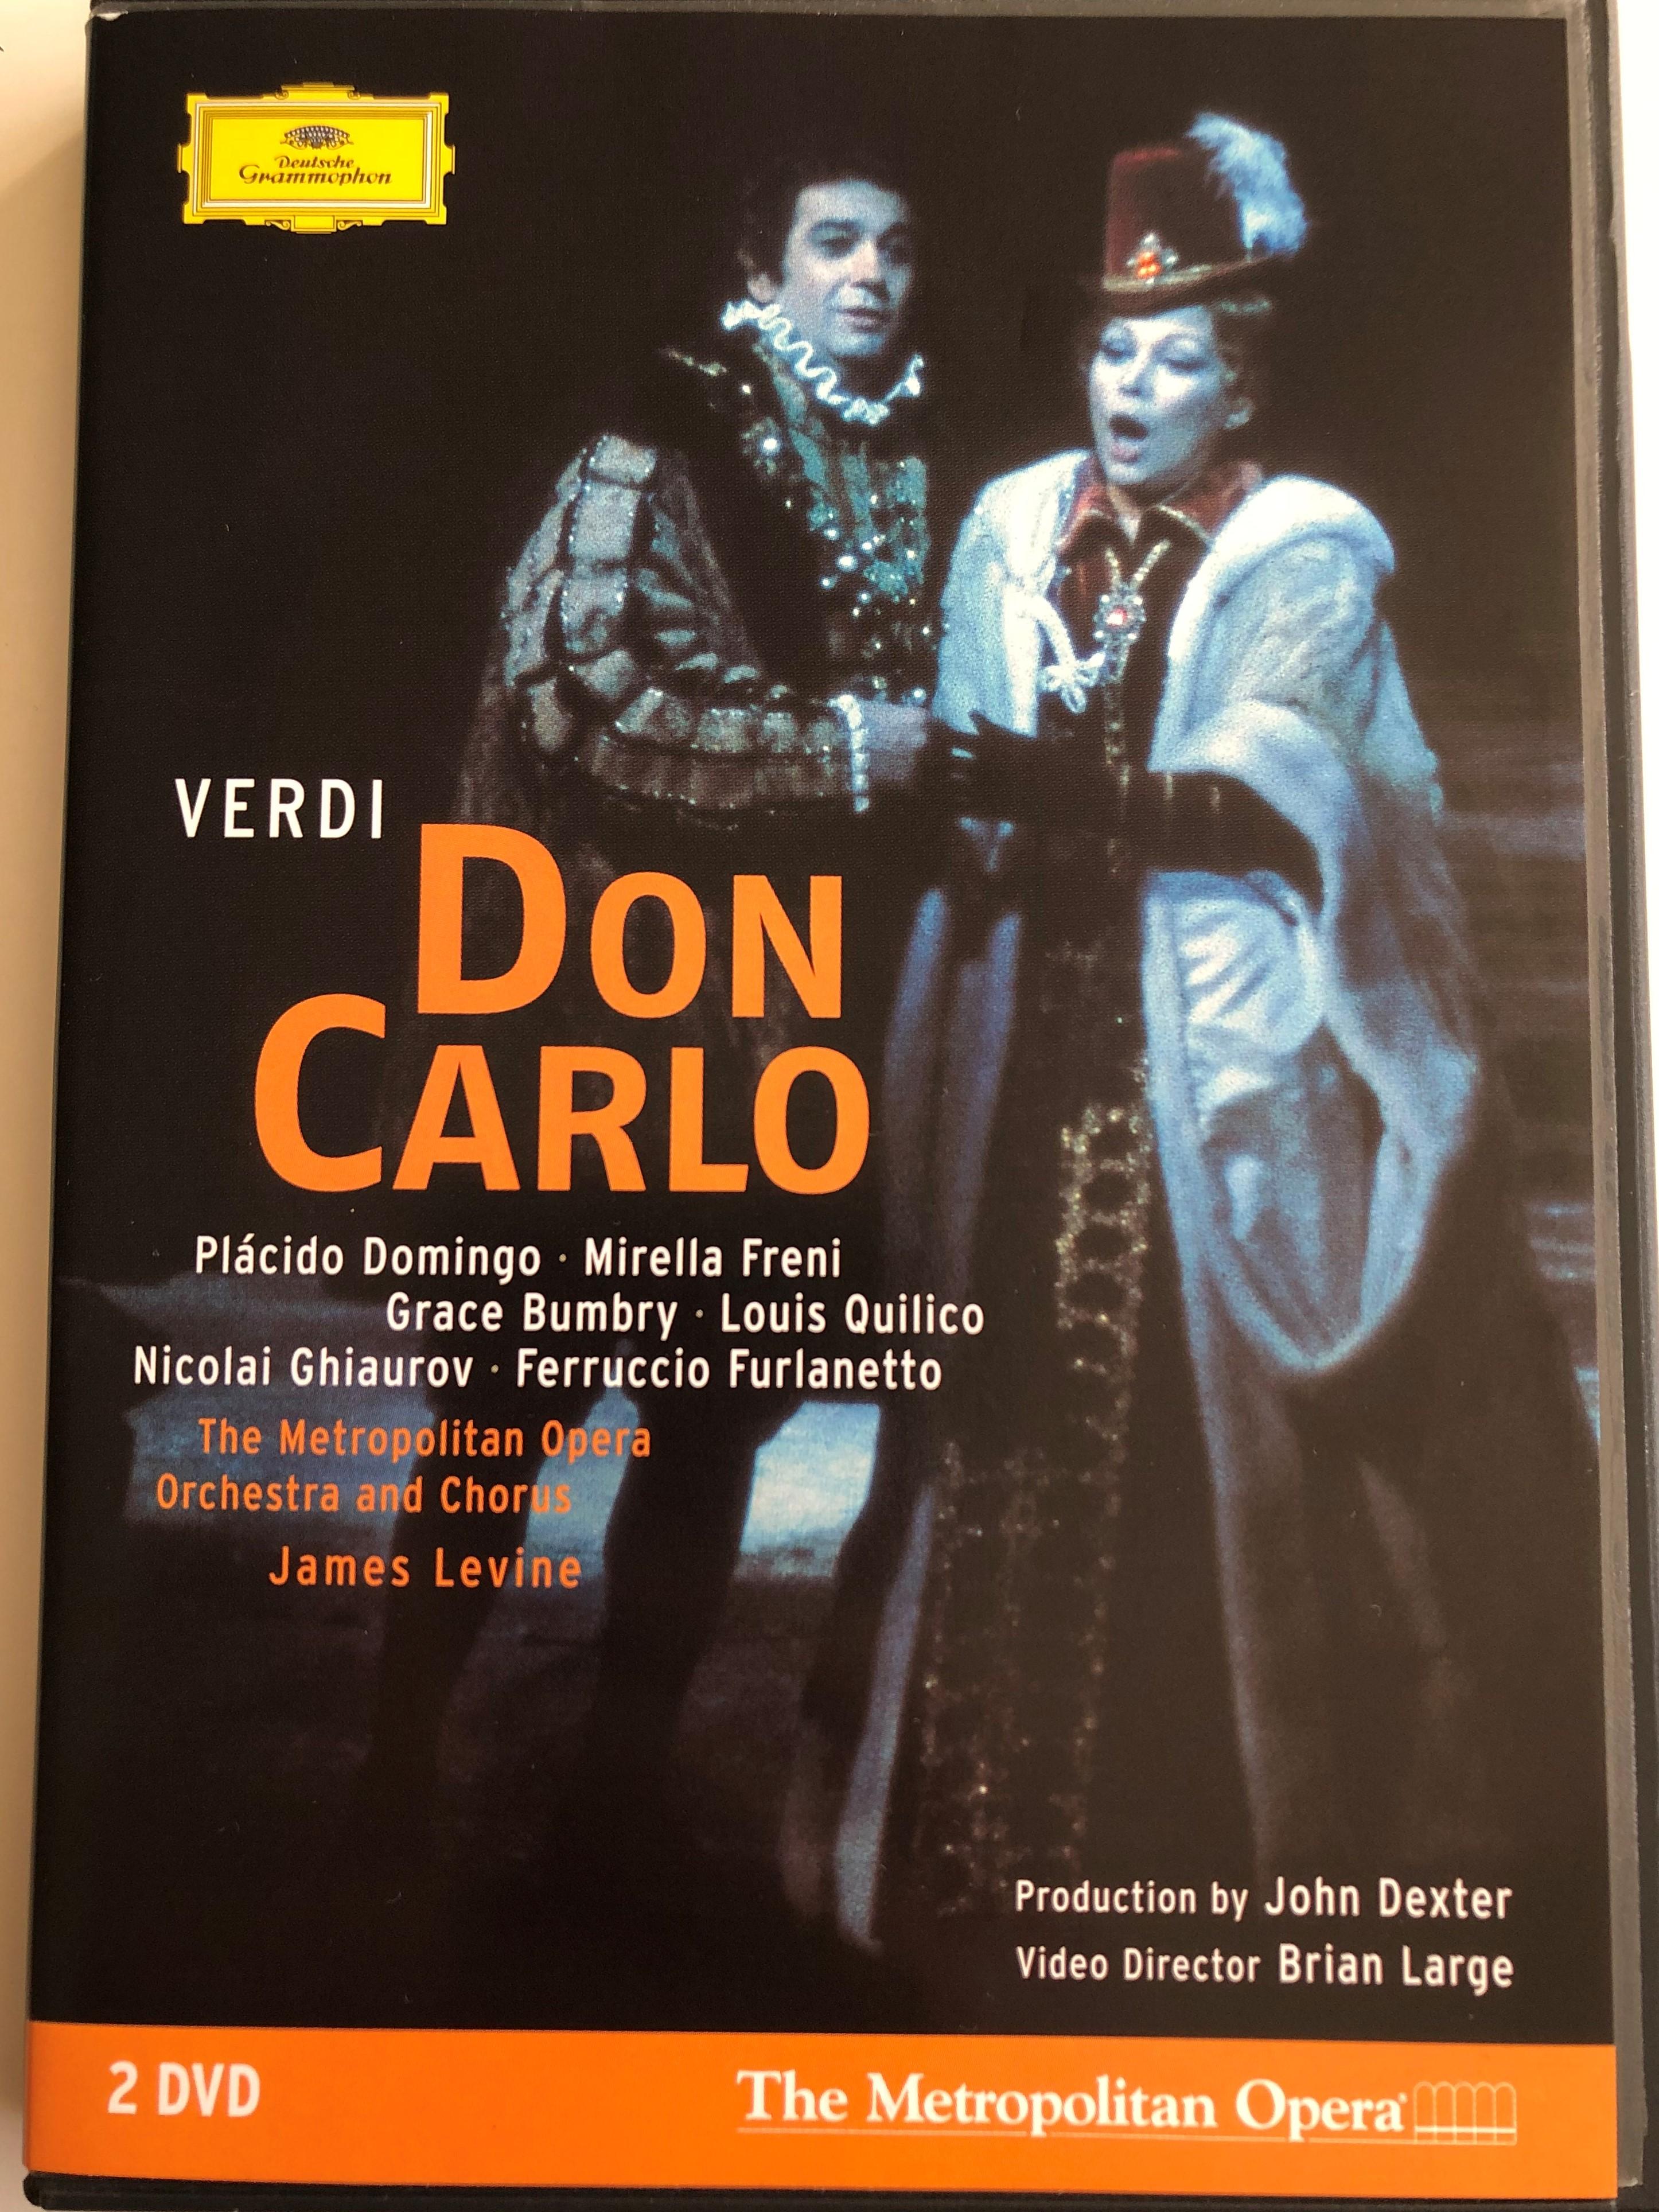 verdi-don-carlo-dvd-2002-pl-cido-domingo-mirella-freni-1.jpg